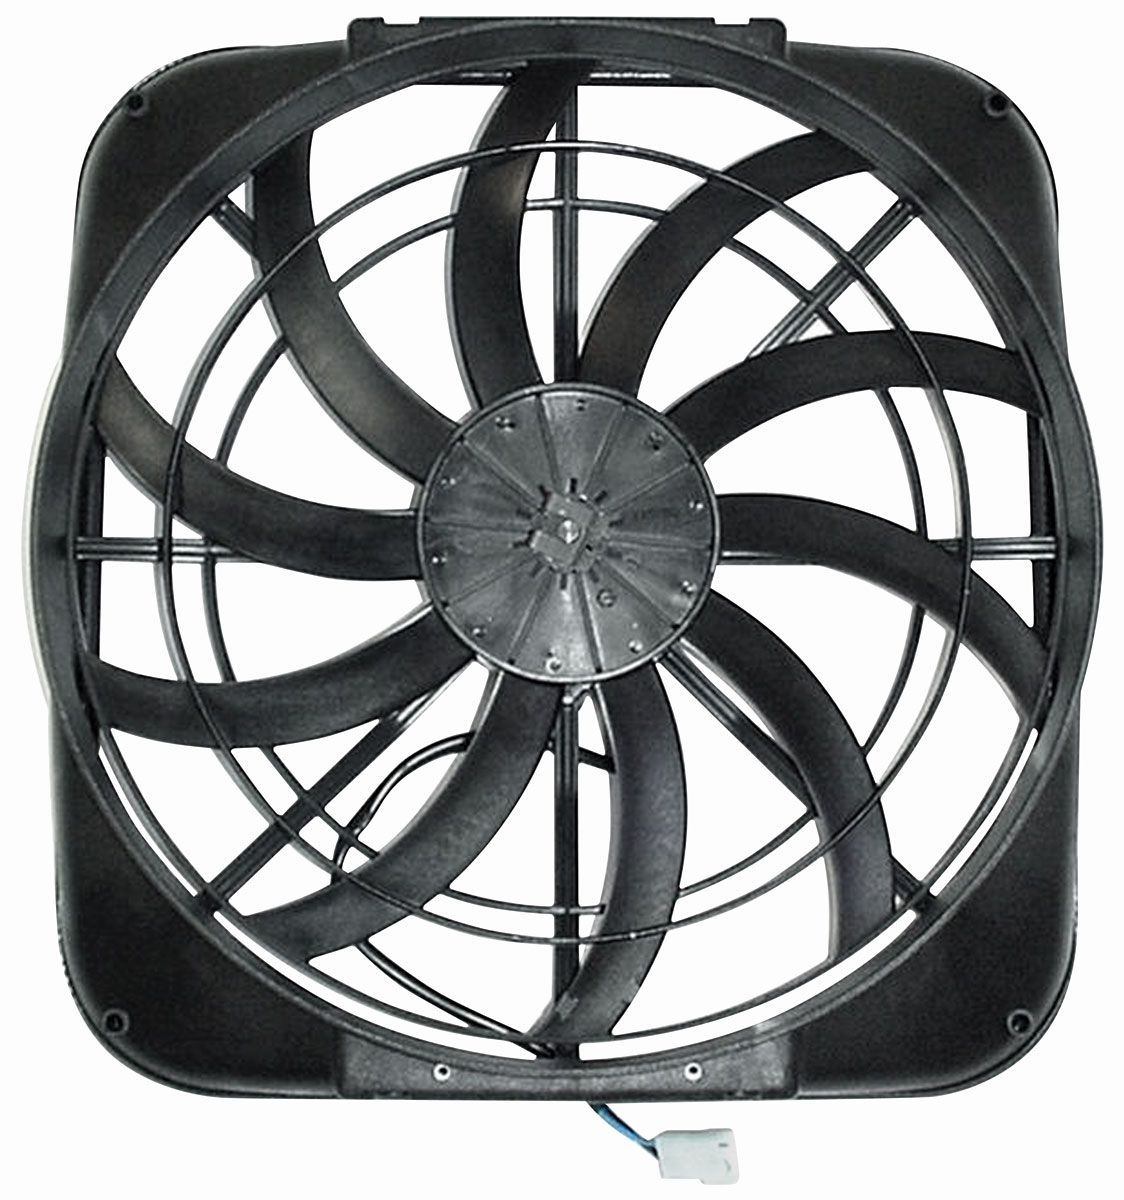 Puller Fan, Maradyne Mach 1, 16